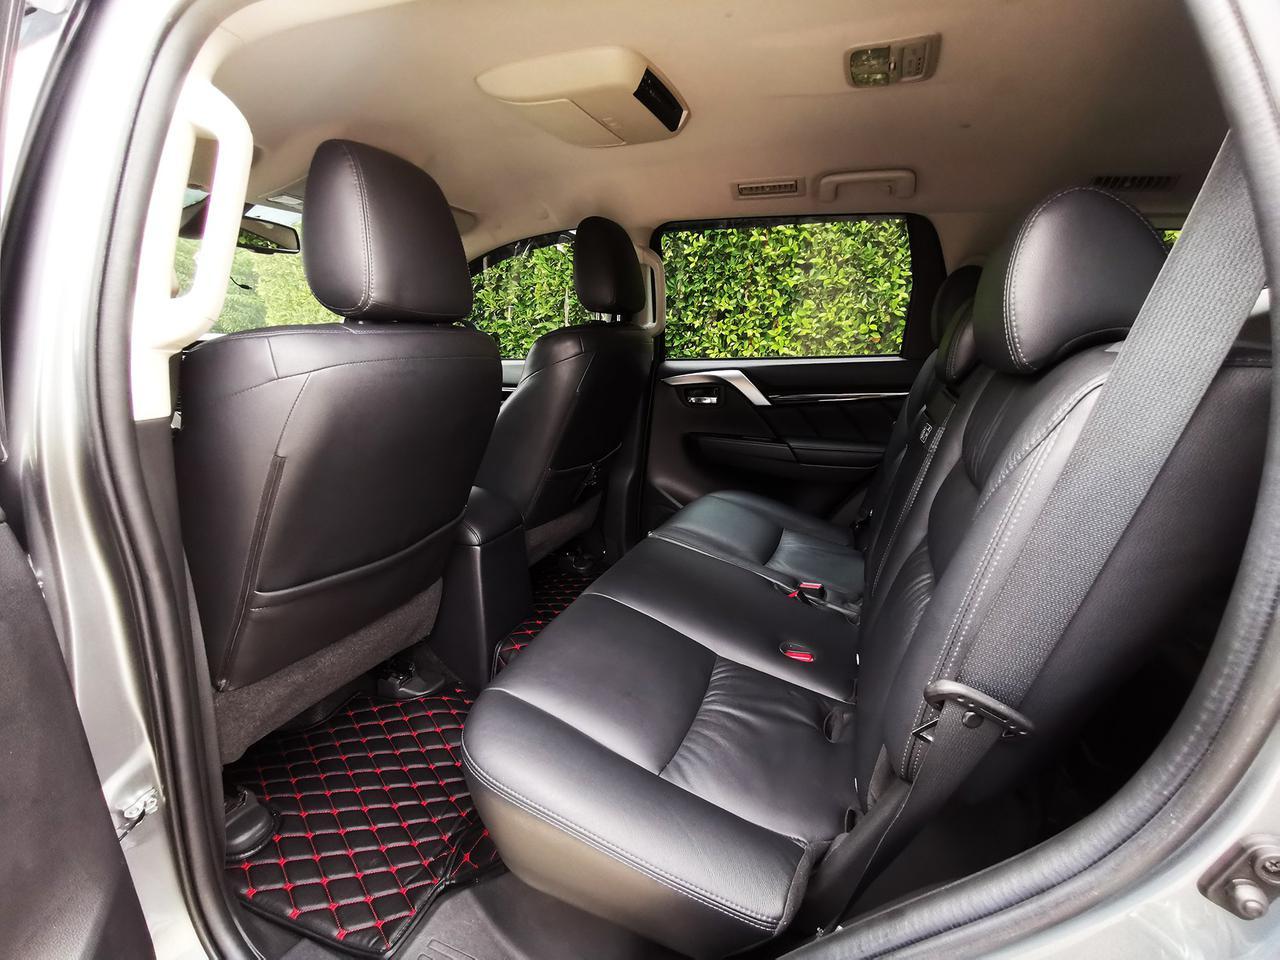 Mitsubishi Pajero Sport 2.4 GT Premium (ปี 2018) SUV AT รูปที่ 4